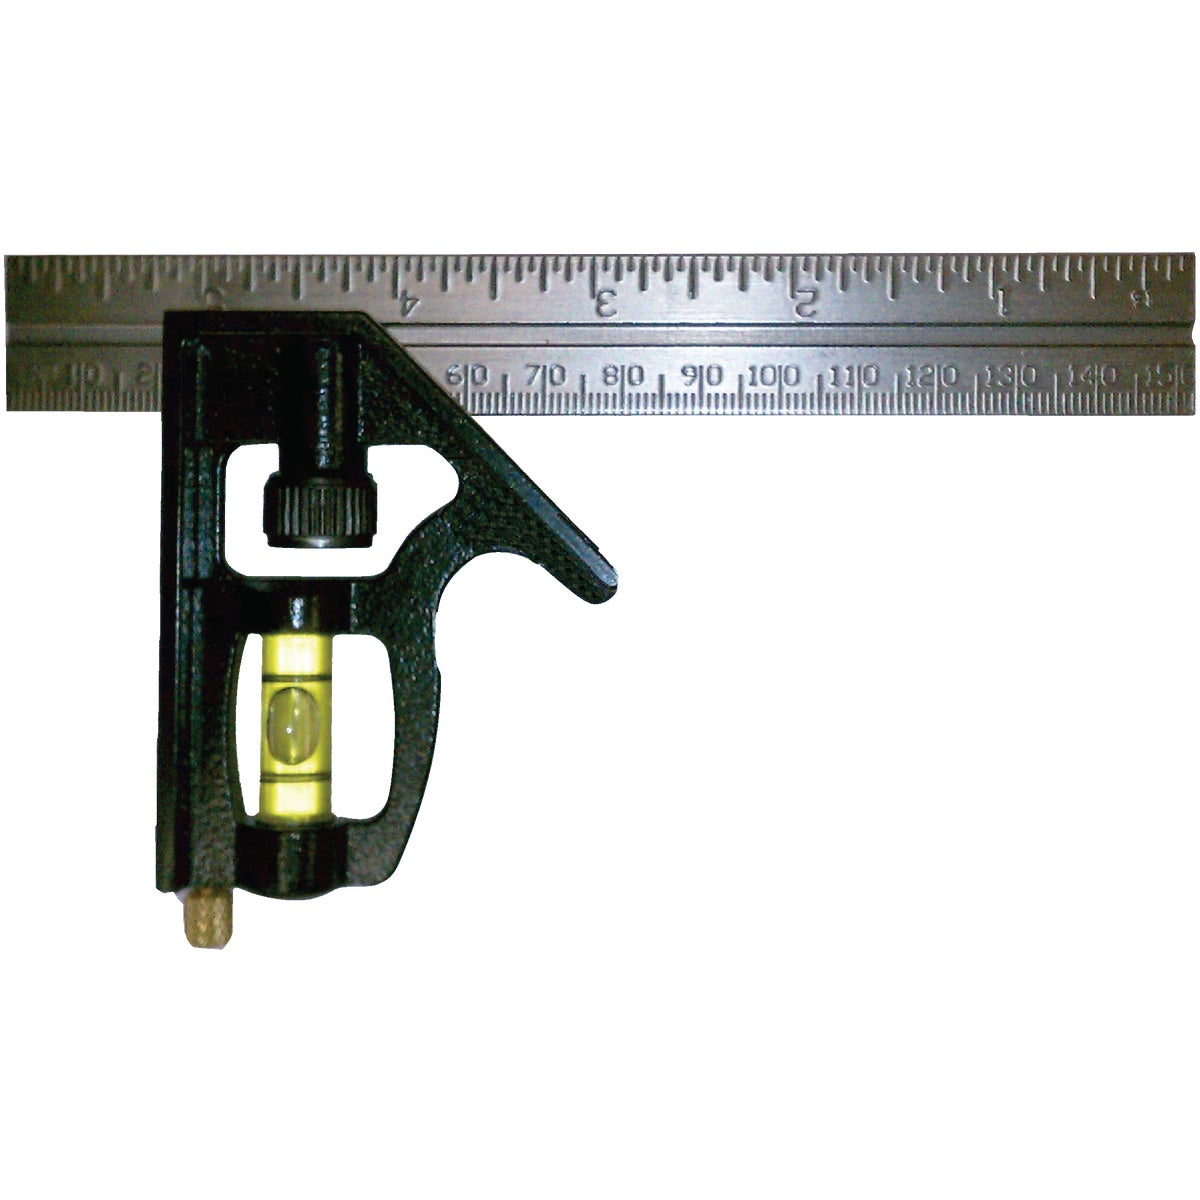 "6"" METRIC COMBO SQUARE - 406EM by Johnson Level & Tool"